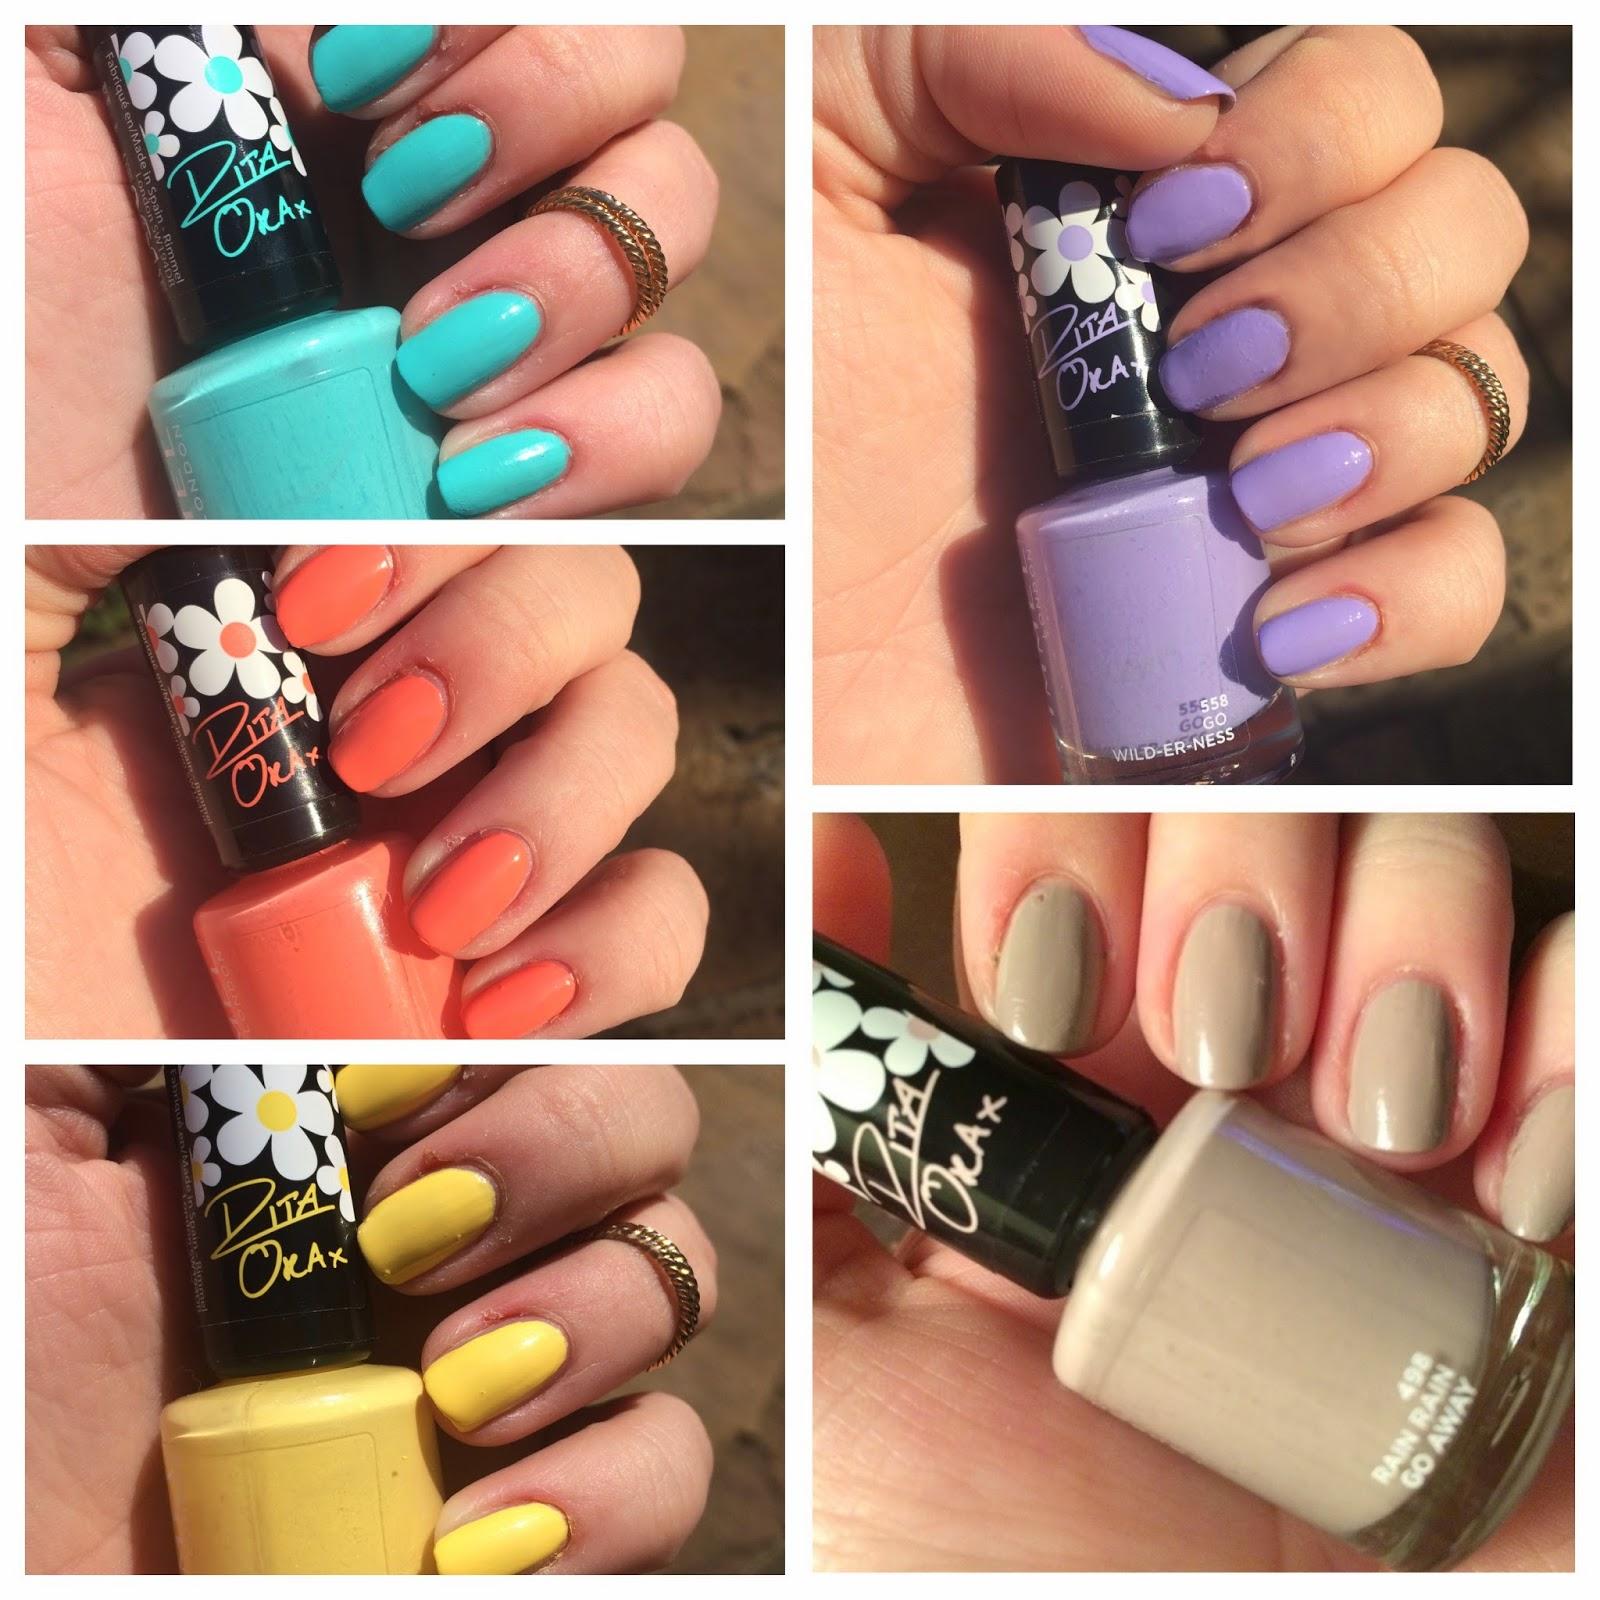 Nail Polish By Rita Ora Woooaaah